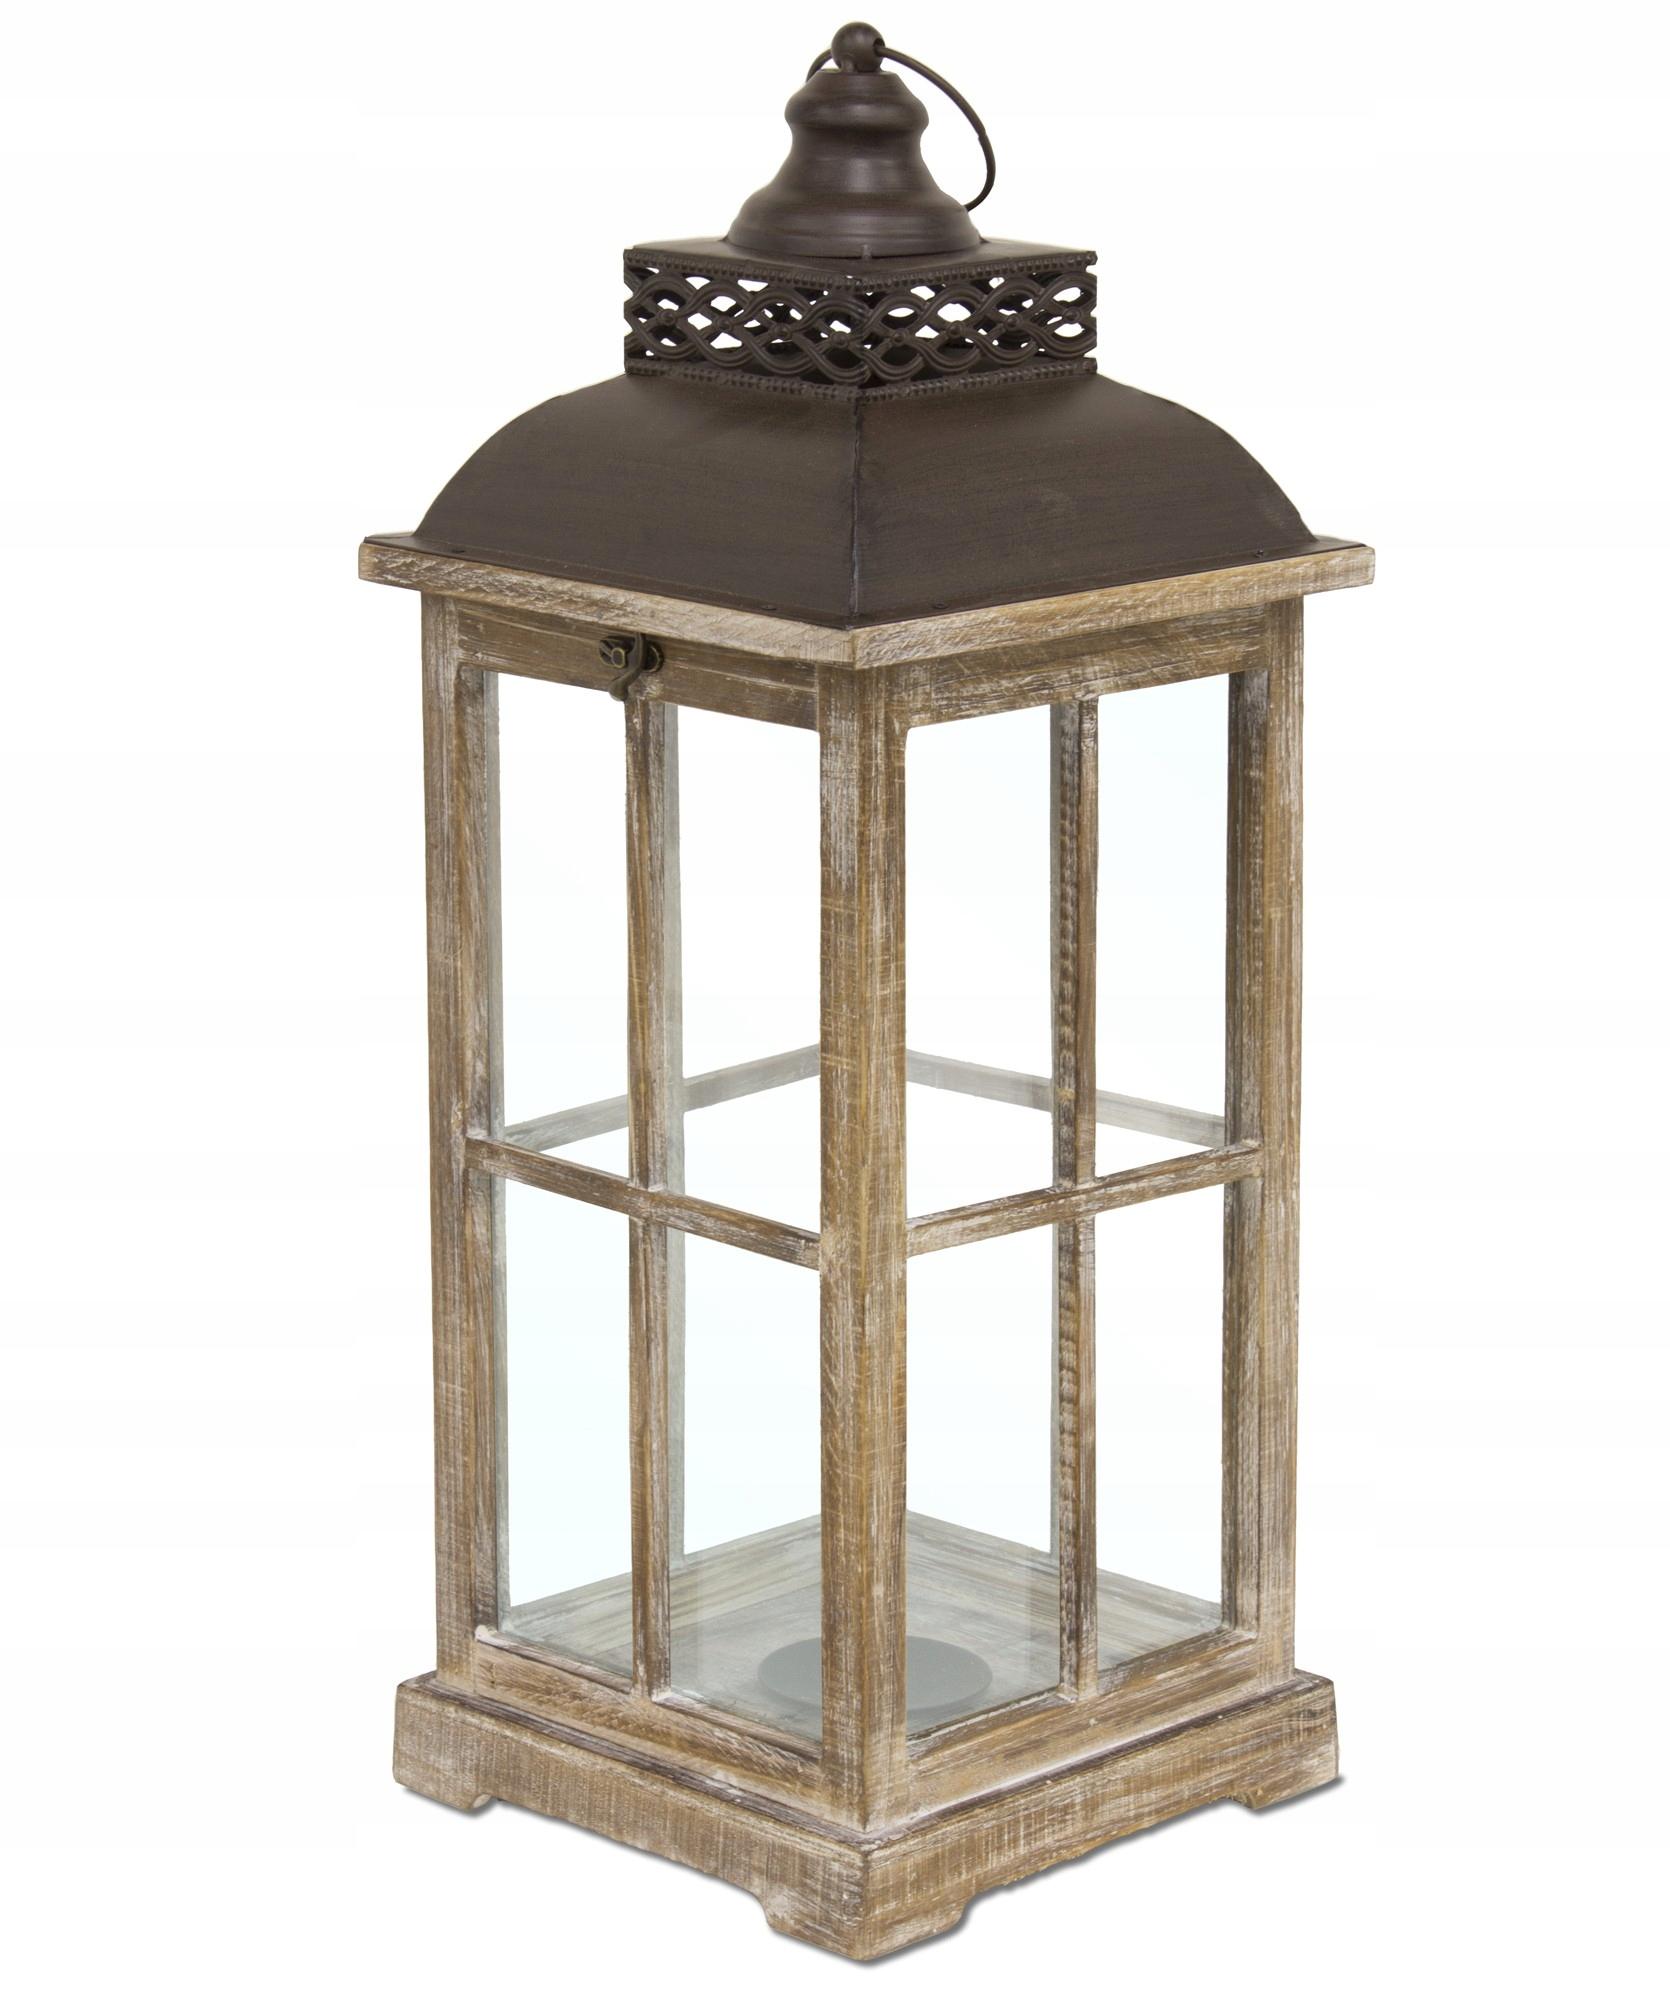 Svietidlá svietidla drevené hnedé 65 cm retro